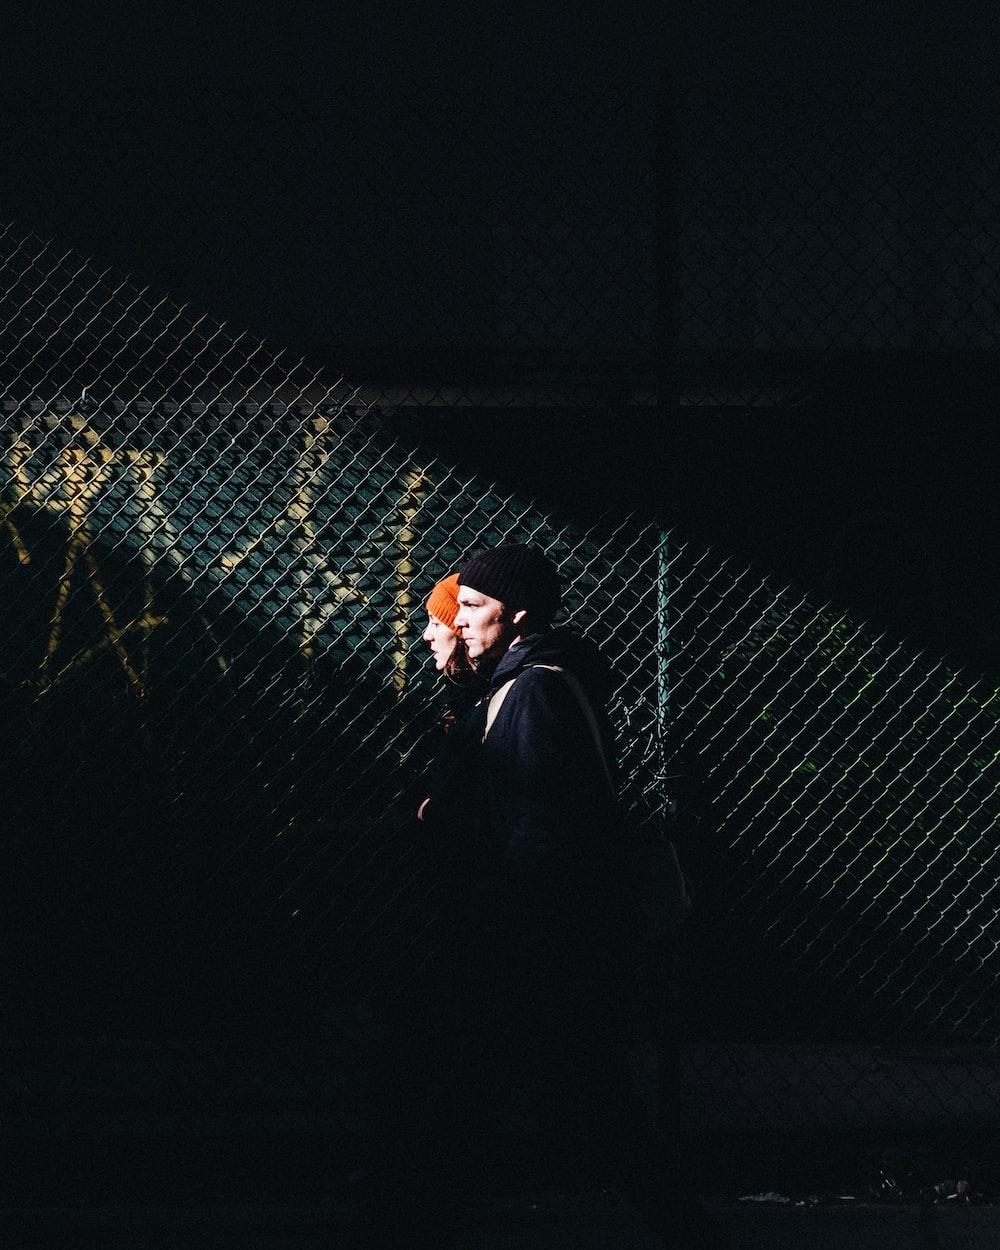 man in black leather jacket standing beside metal fence